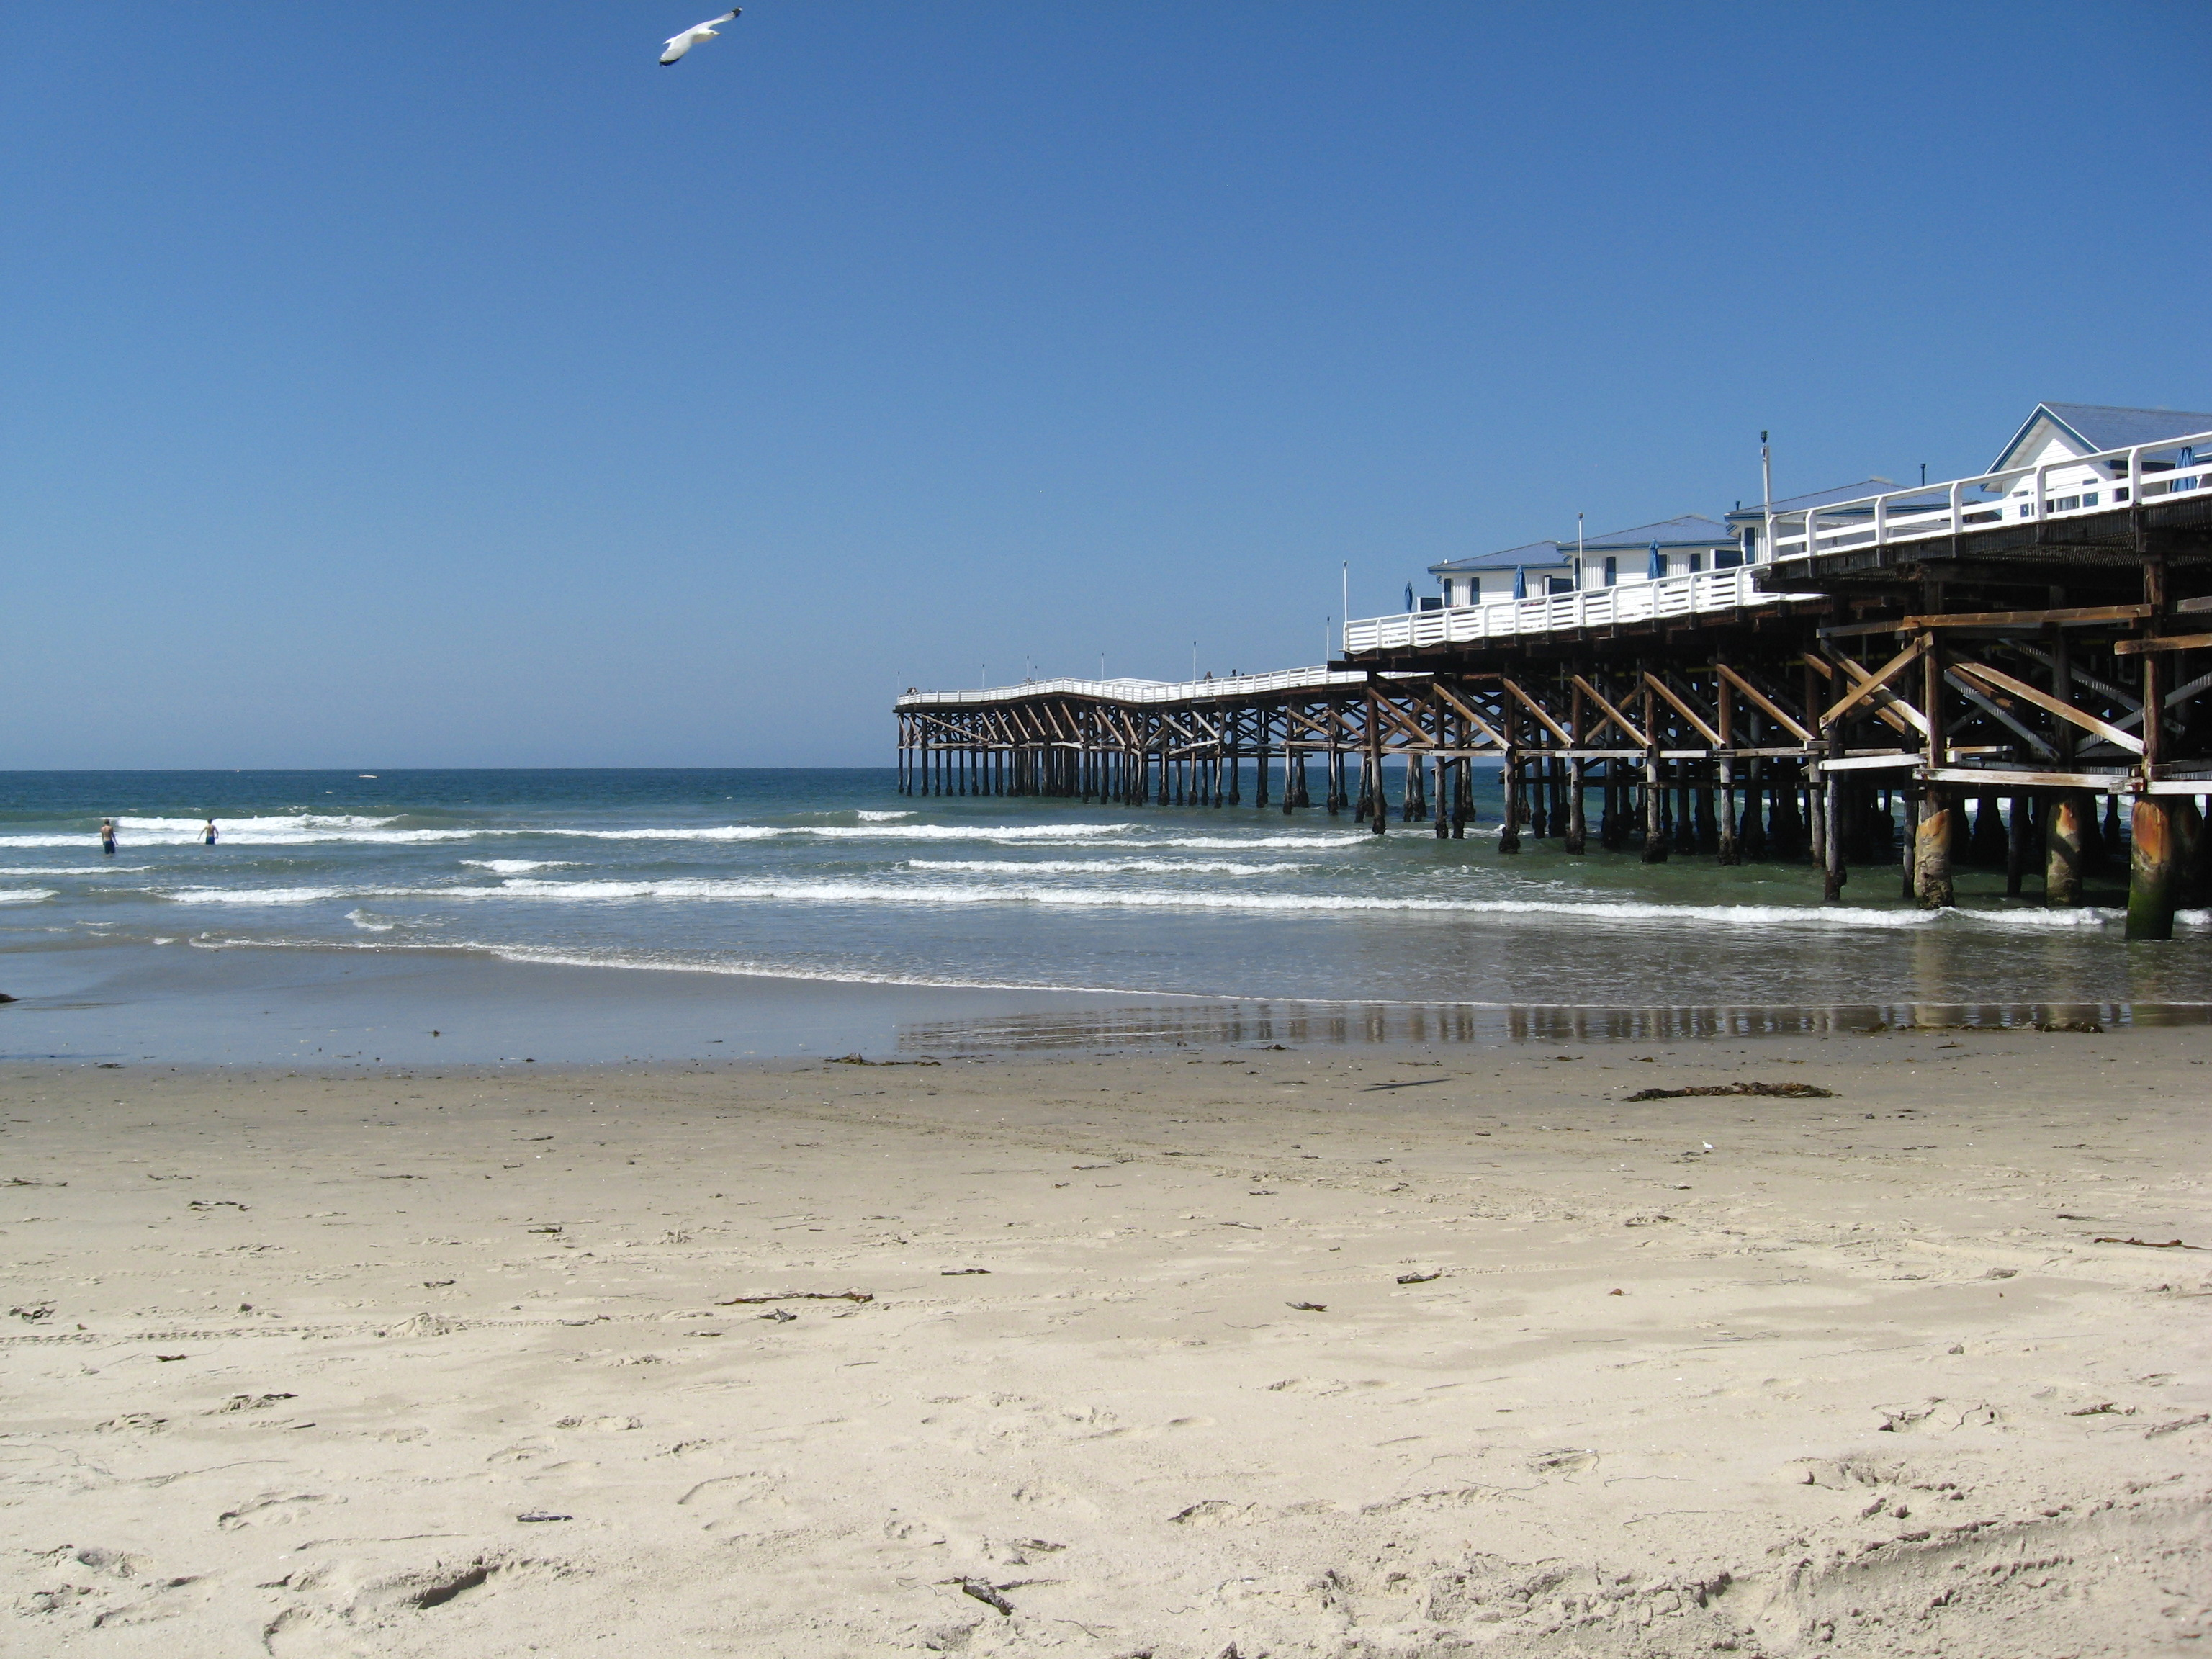 Pacific Beach/ Crystal Pier